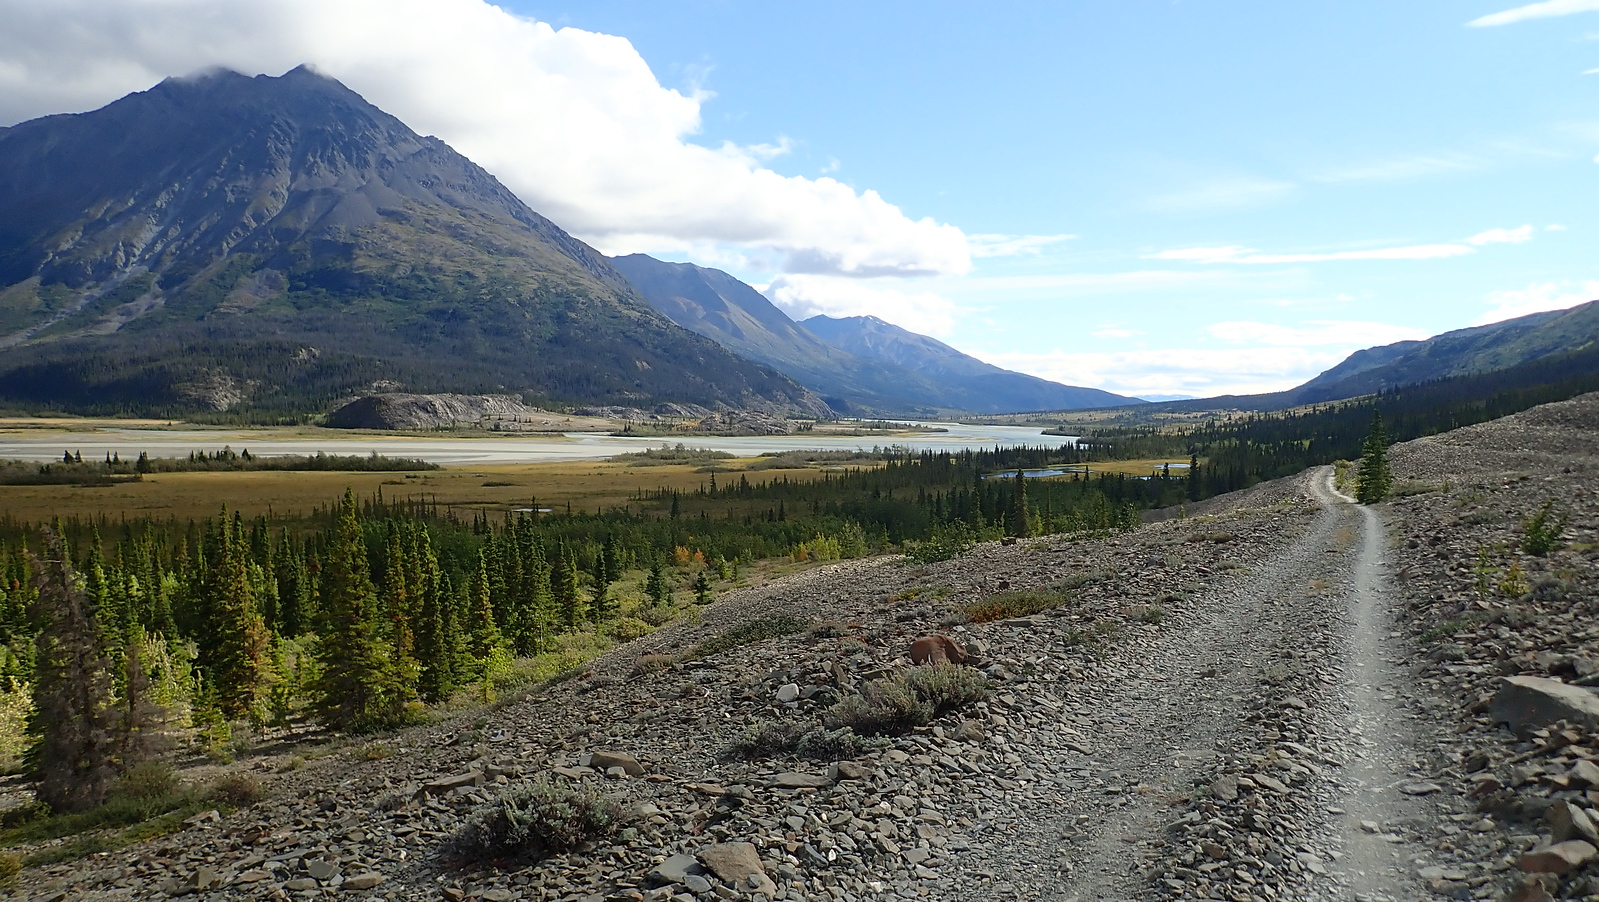 Alsek trail